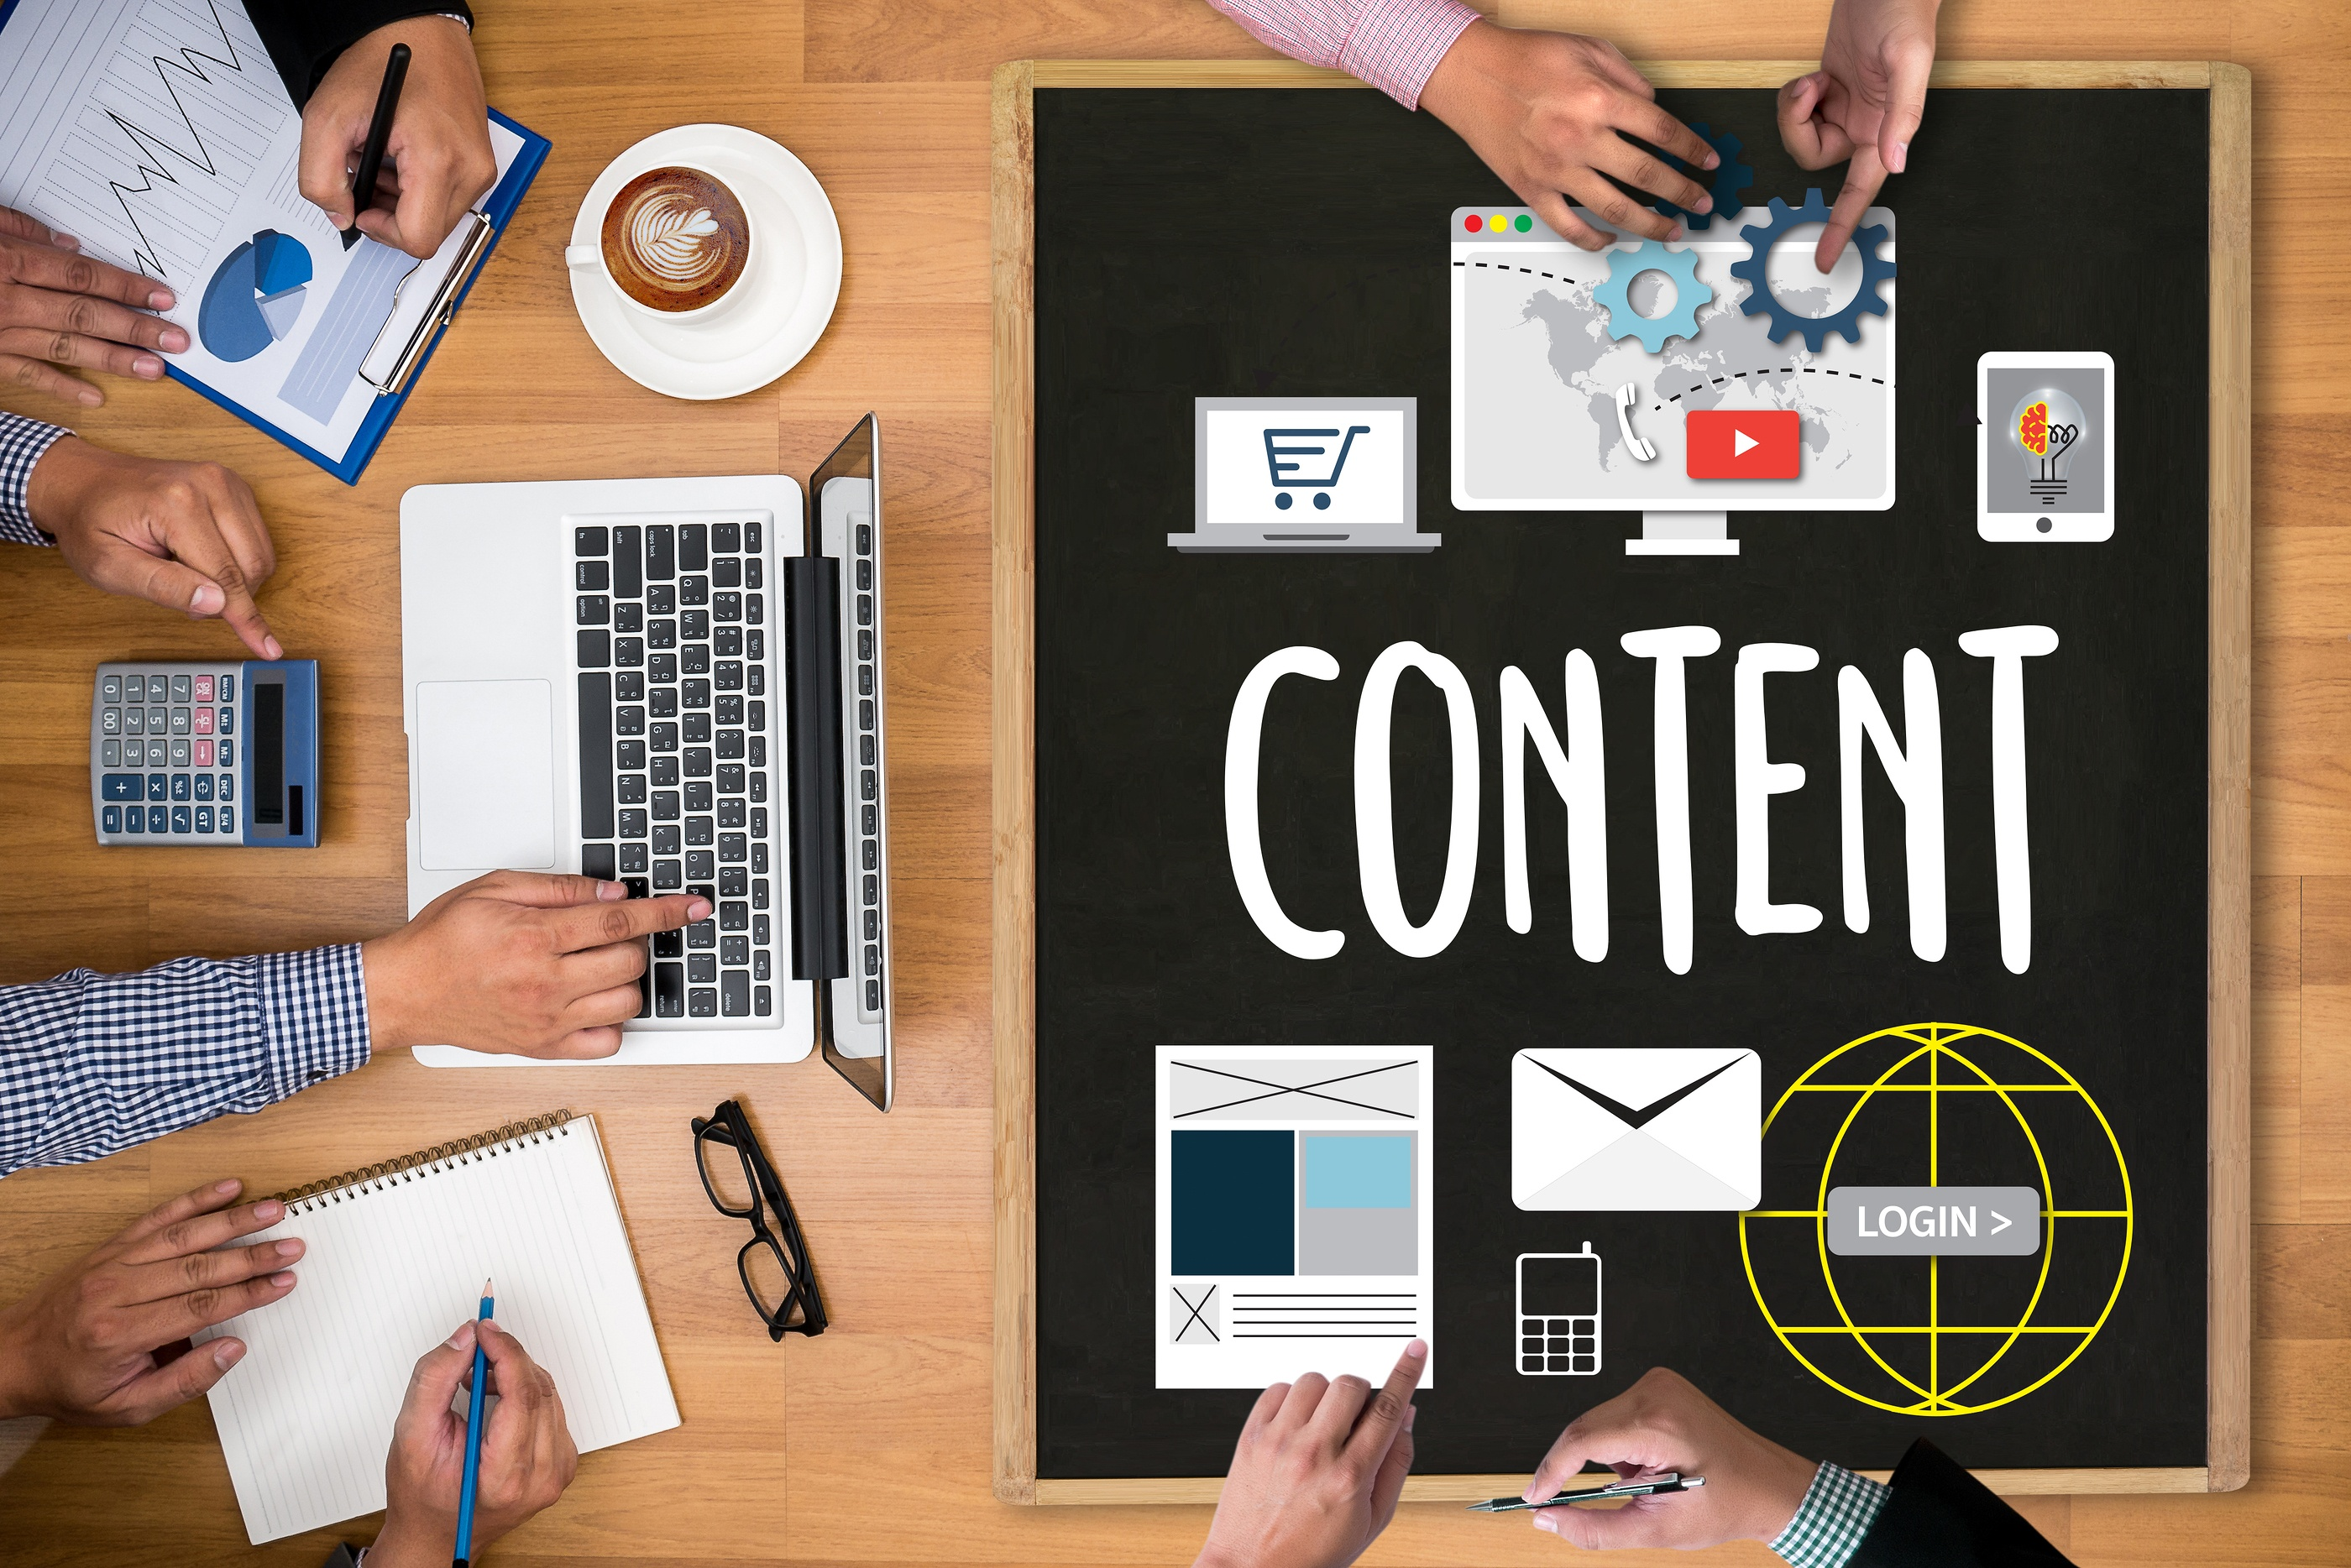 bigstock-Content-Marketing-Online-Conc-161053115